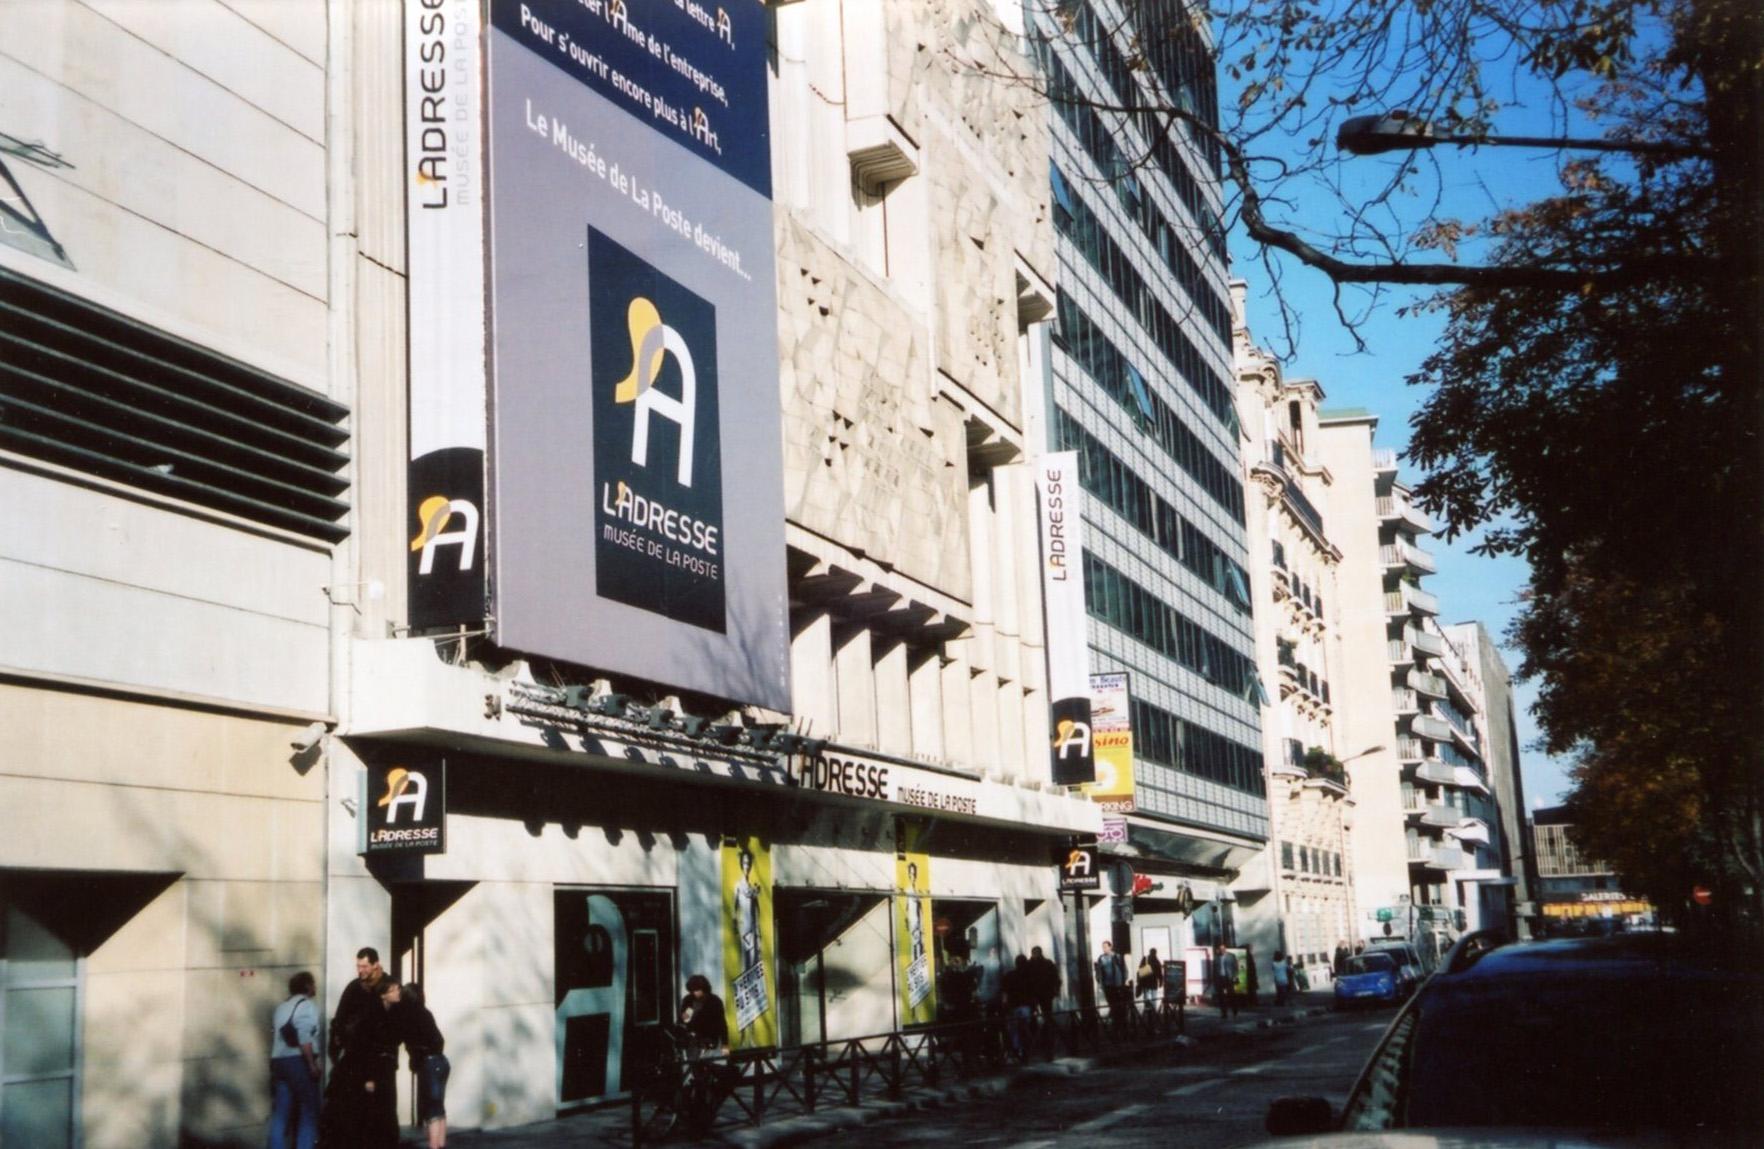 Fichierl Adresse Musée De La Poste Façadejpg Wikipédia